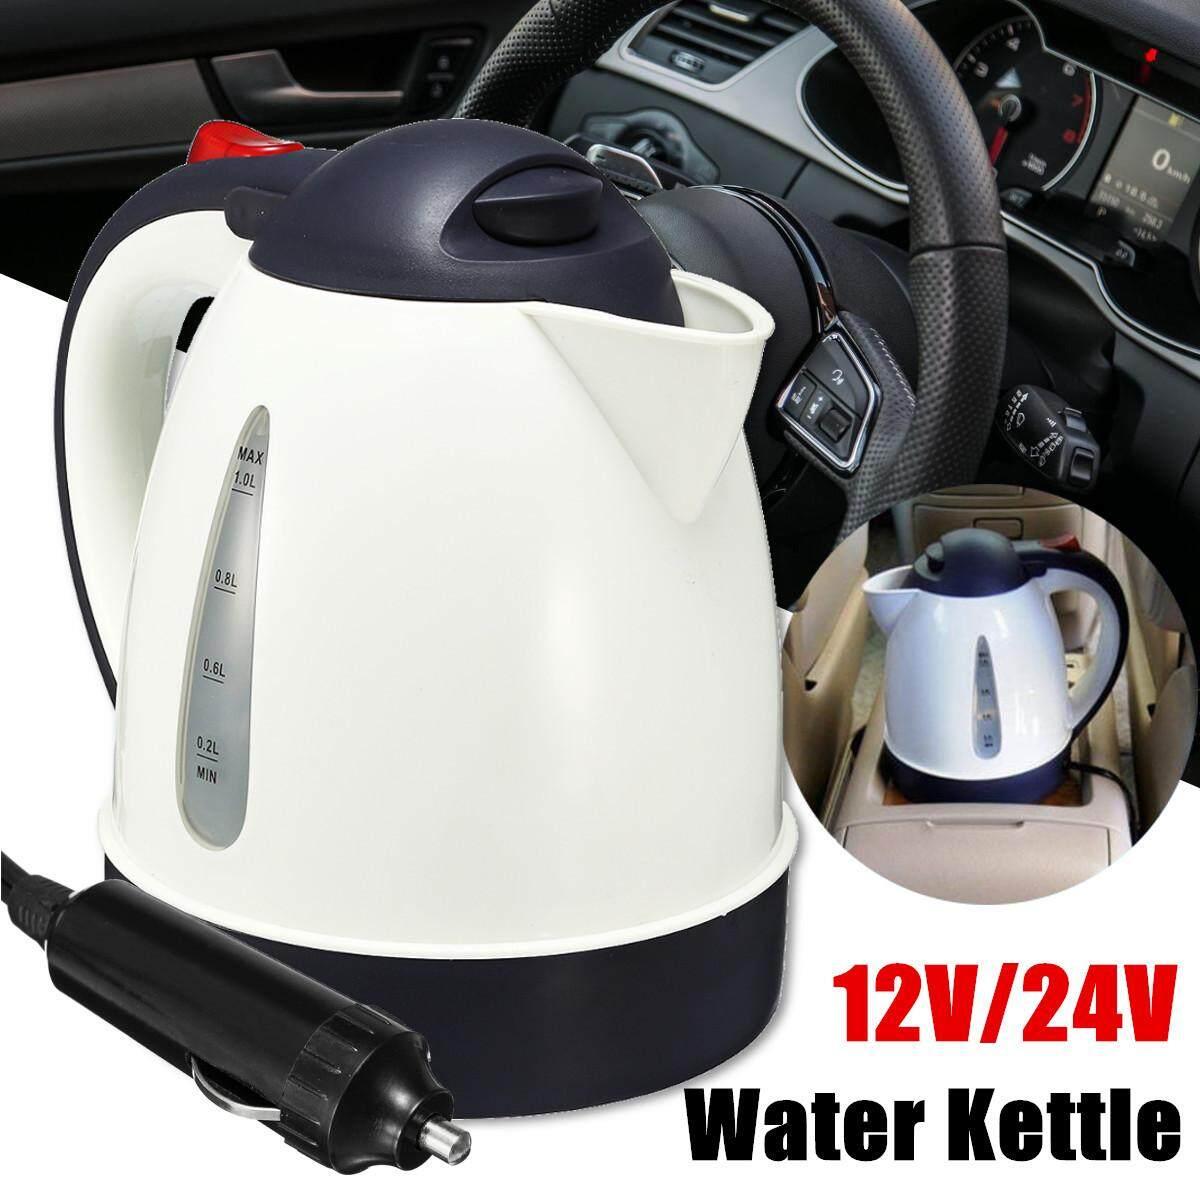 1000ml 12V Portable Car Water Kettle Heater Warmer Travel Camping Tea Coffee Jug#12V